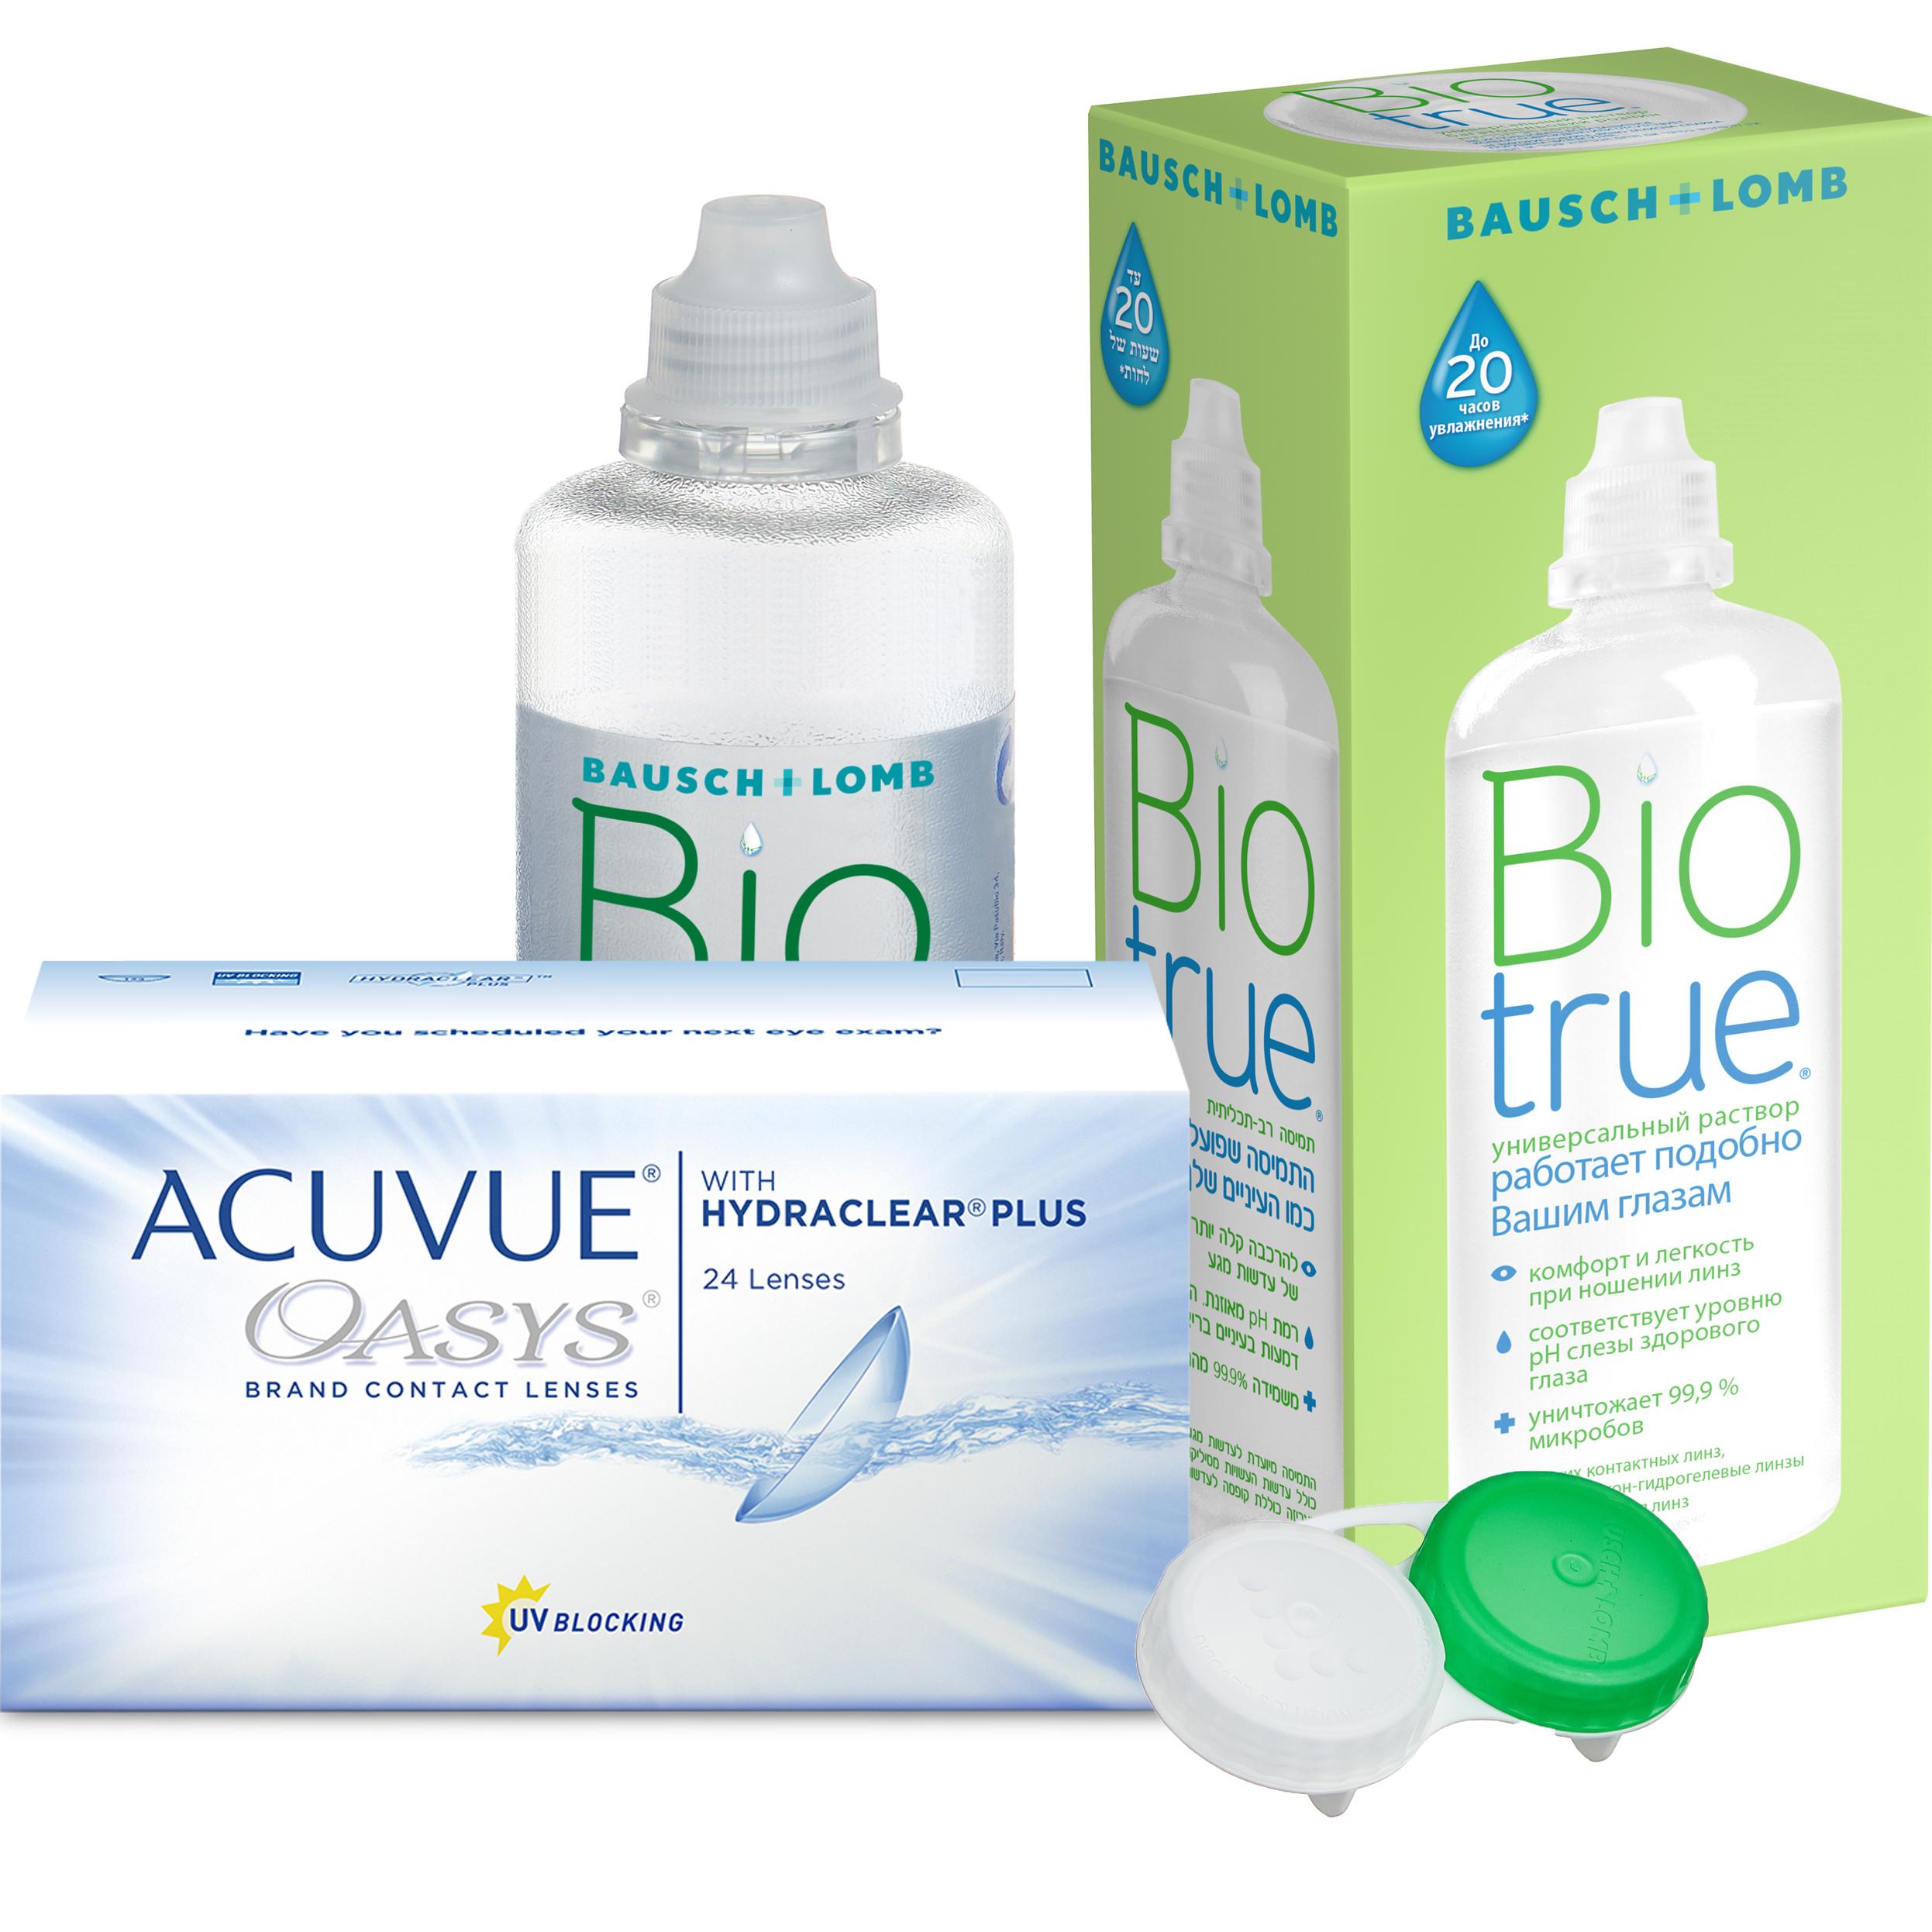 Купить Oasys with Hydraclear Plus 24 линзы + Biotrue, Контактные линзы Acuvue Oasys with Hydraclear Plus 24 линзы R 8.8 +5, 50 + Biotrue 300 мл